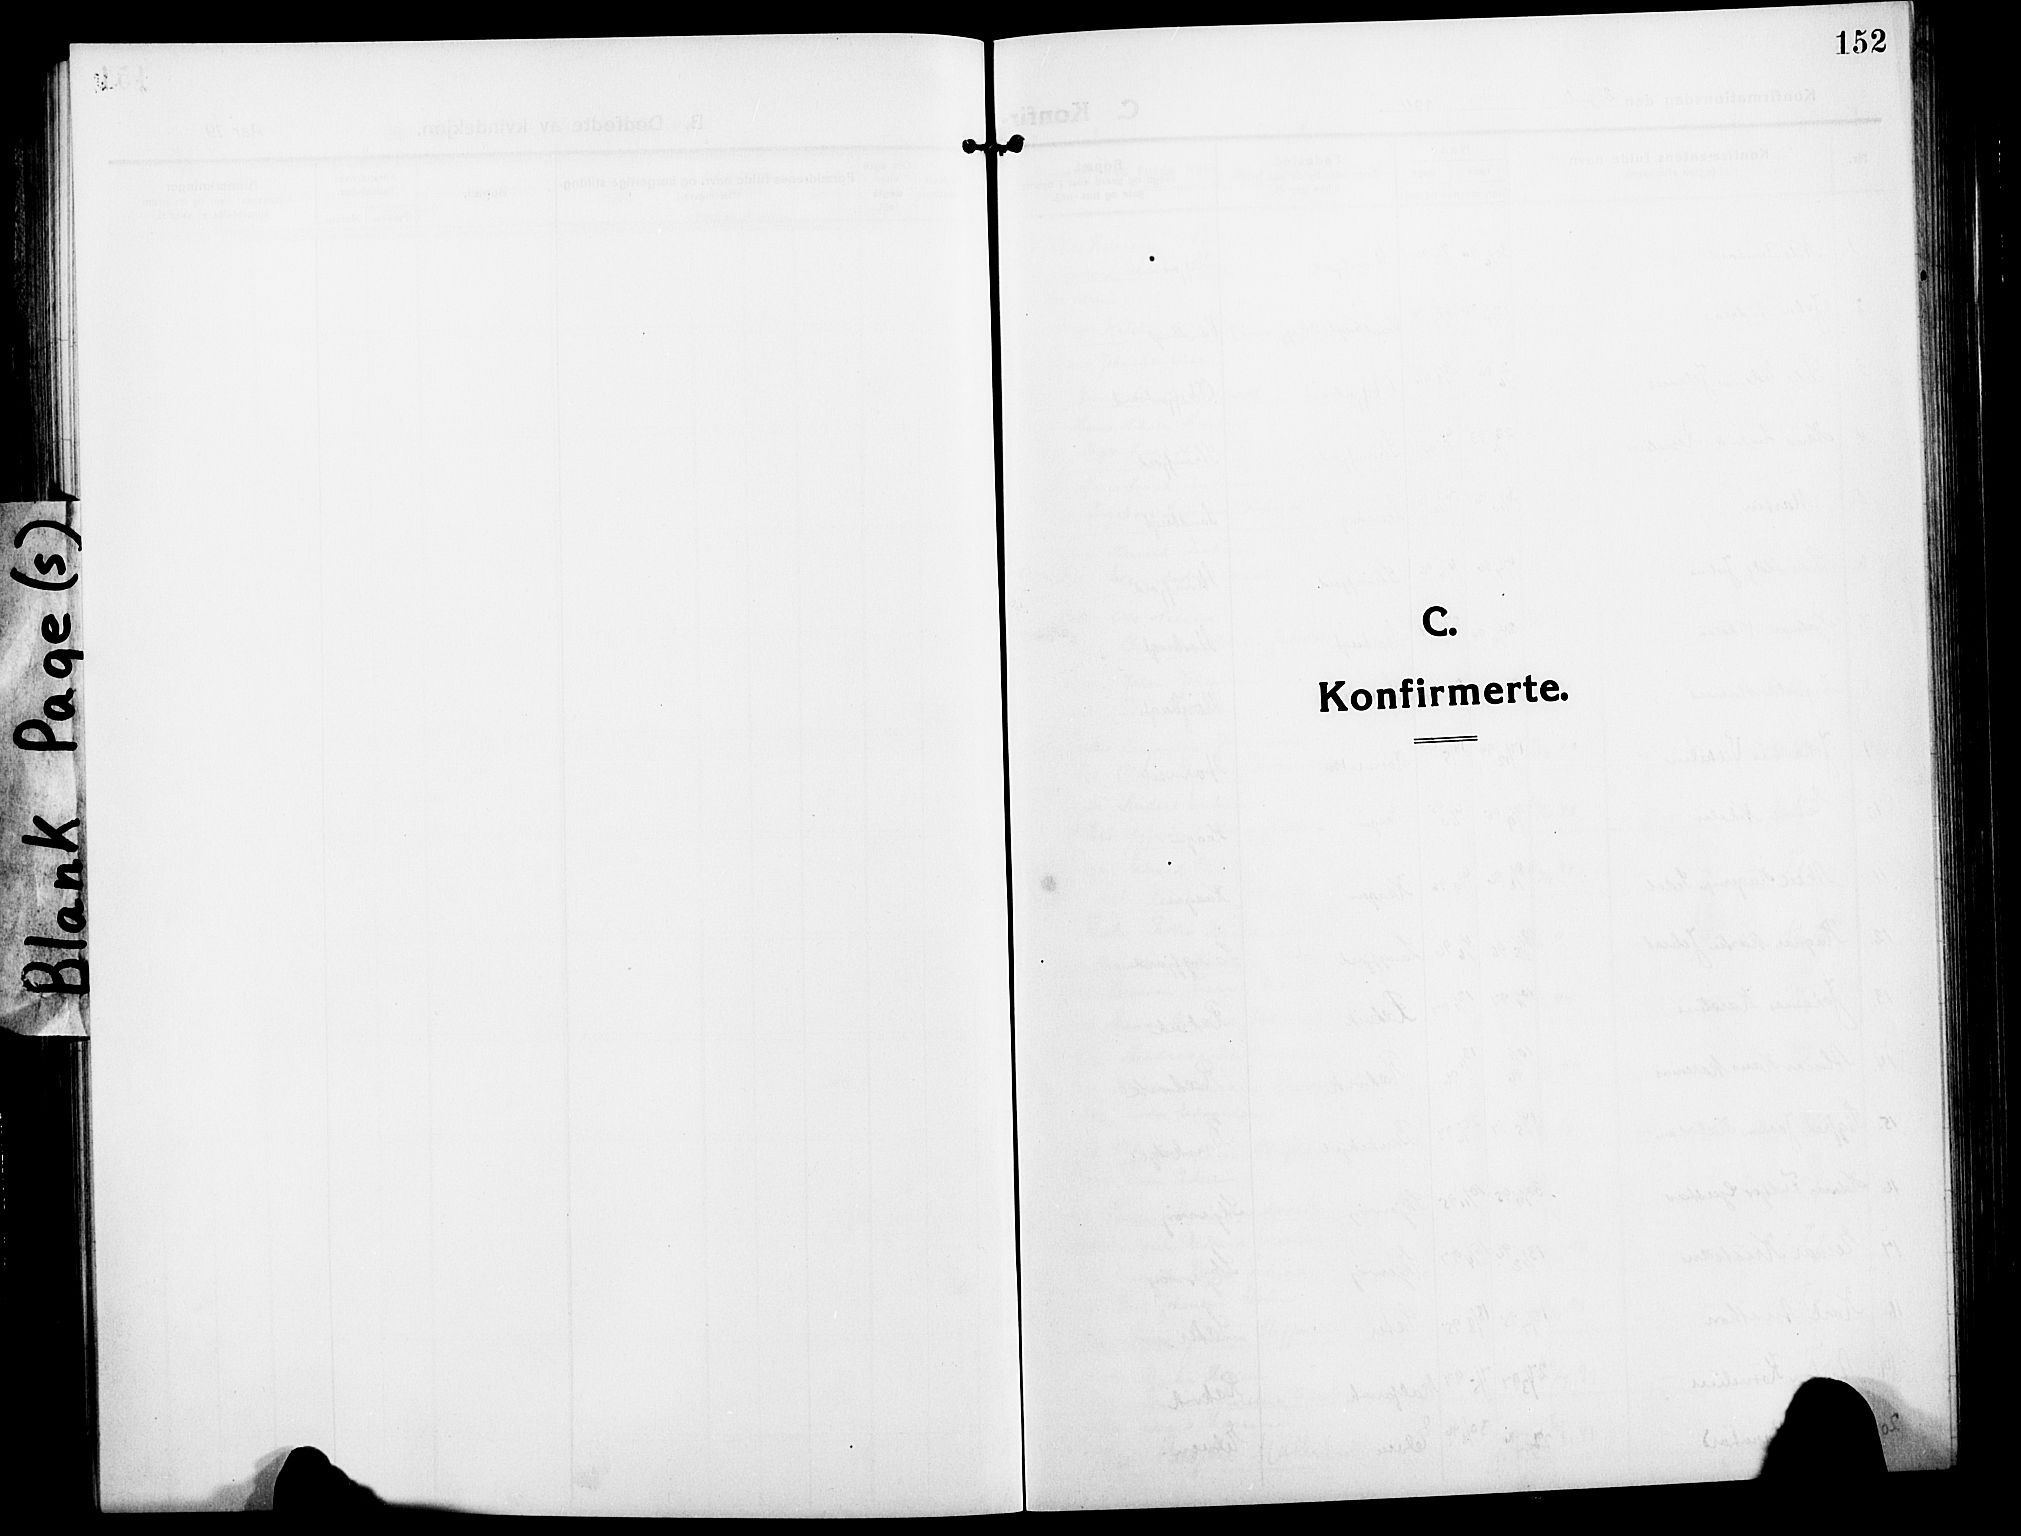 SATØ, Skjervøy sokneprestkontor, H/Ha/Hab/L0009klokker: Klokkerbok nr. 9, 1911-1926, s. 152